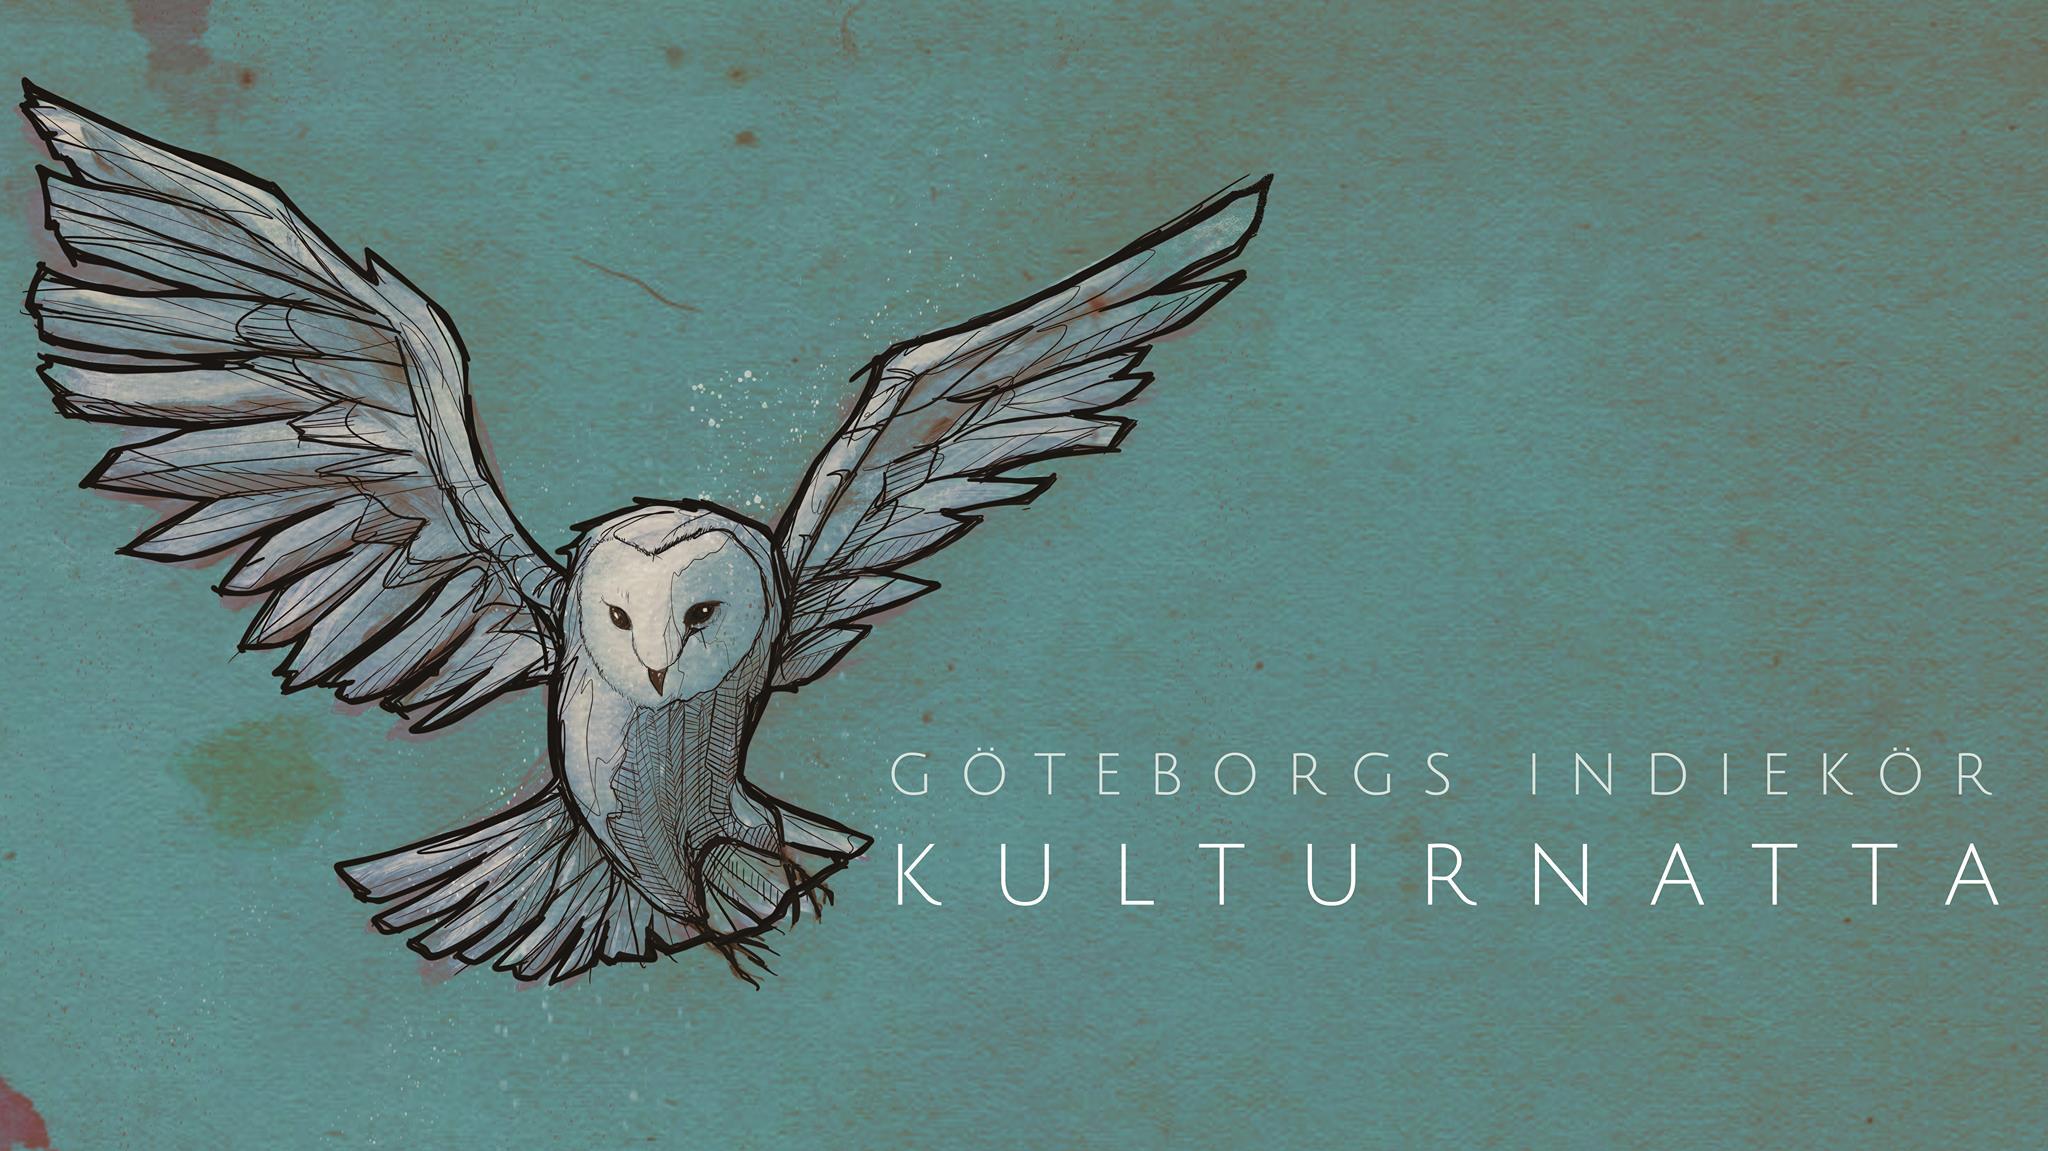 Göteborgs Indiekör | Kulturnatta